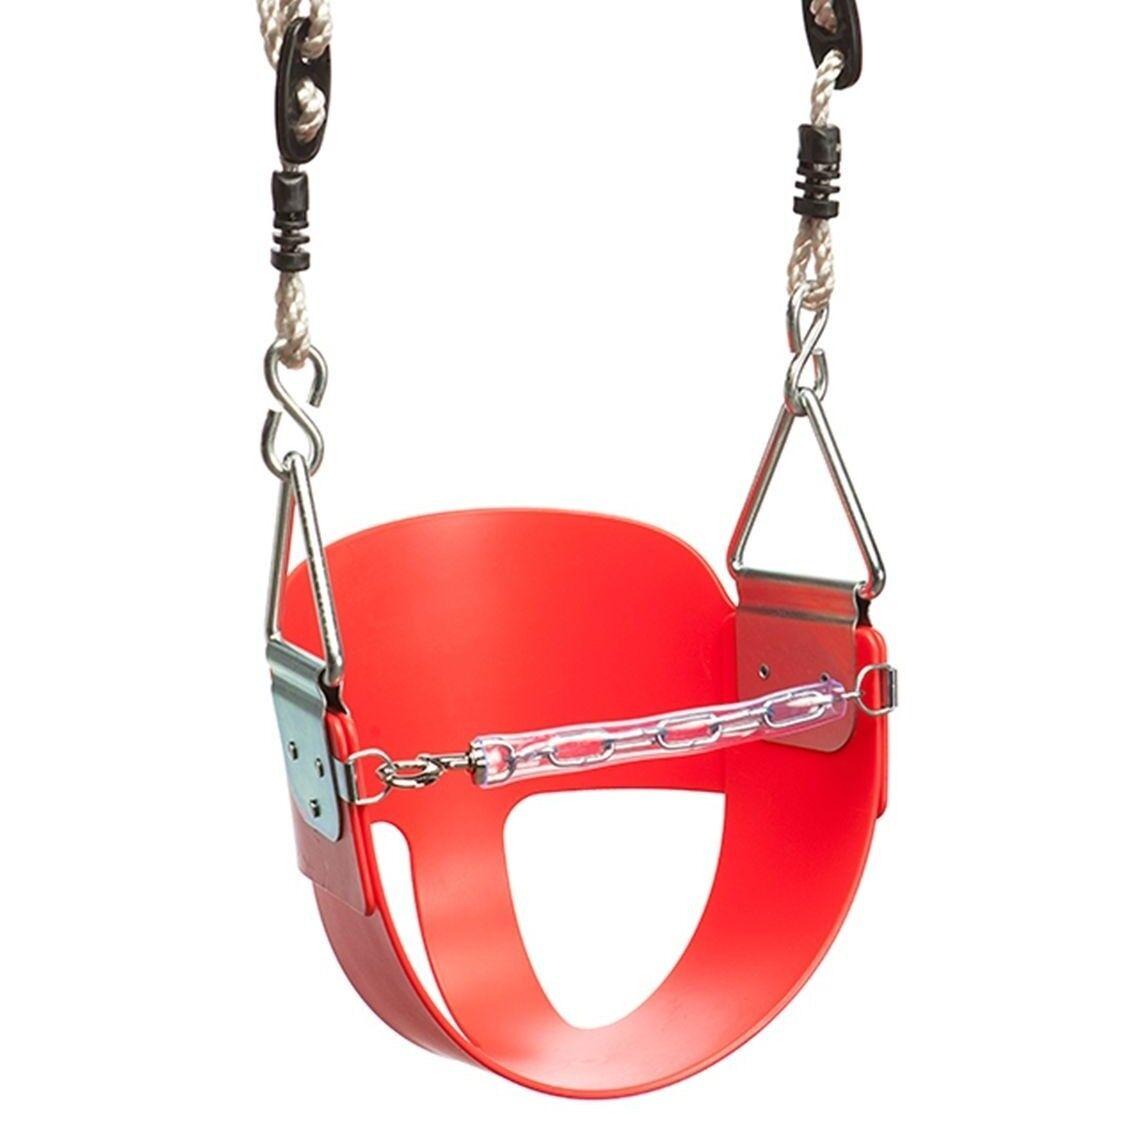 Svinge Slide Clive TODDLER Svinge SEAT röd with Safety Chain - Australian Brand